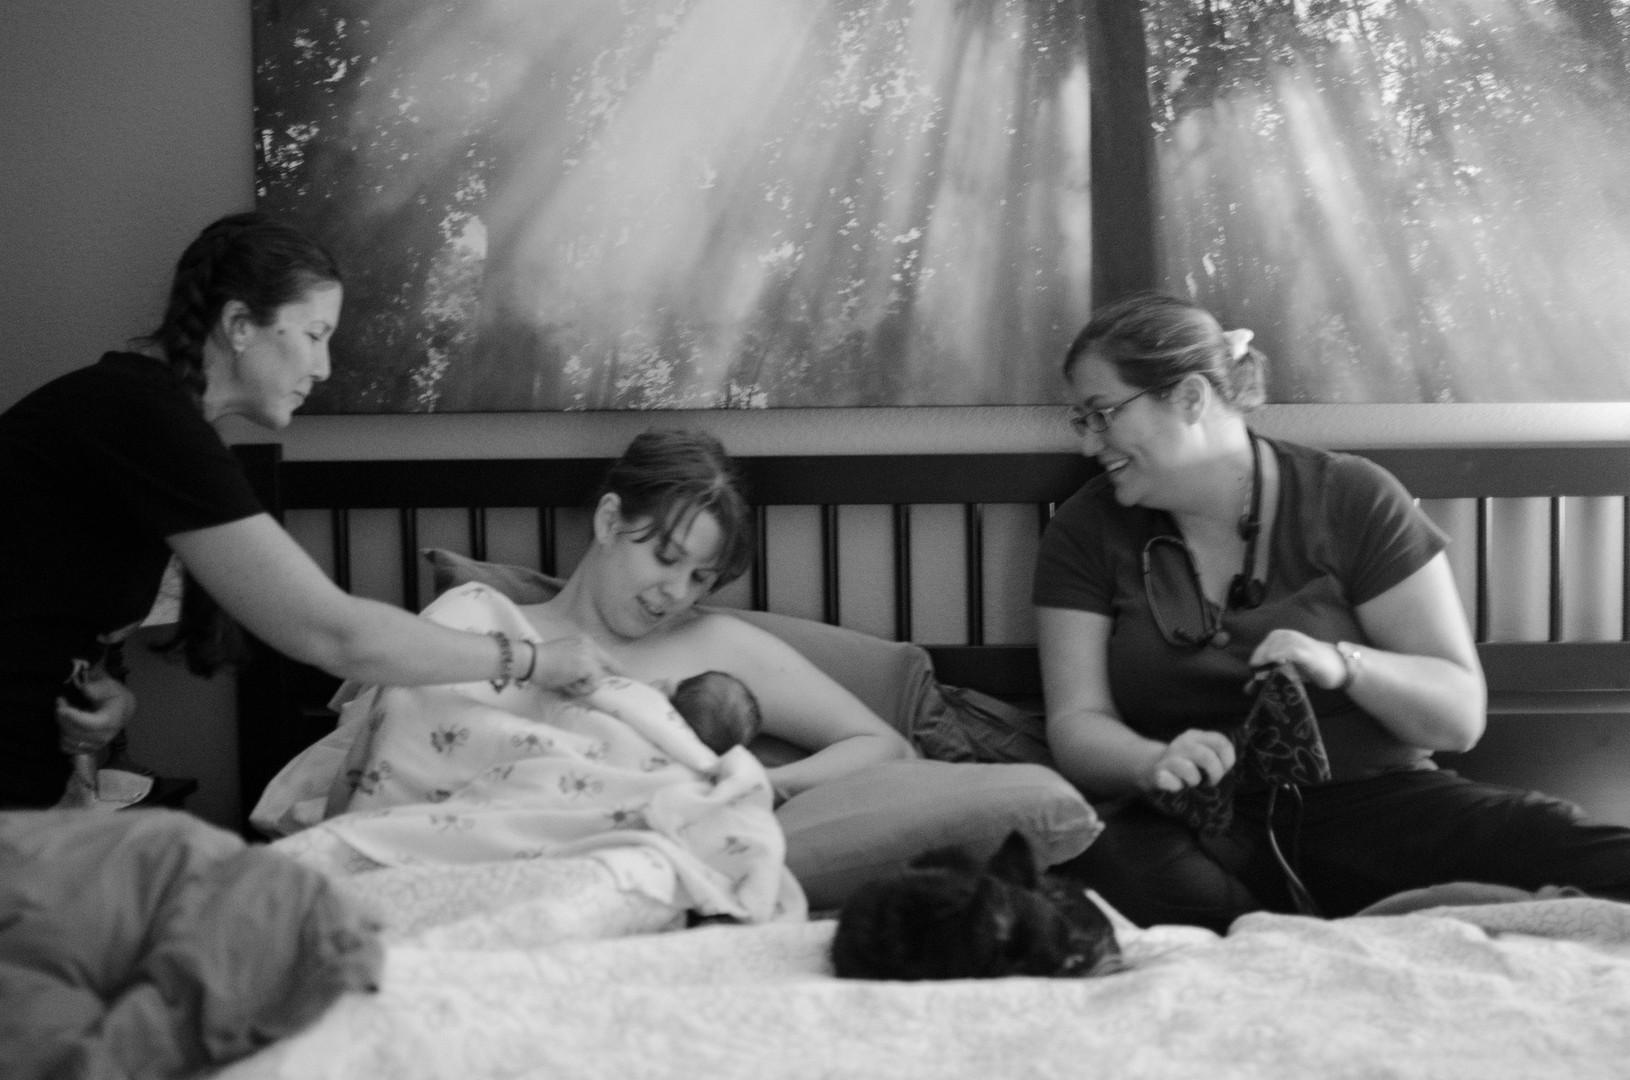 Careful watch over mom and newborn